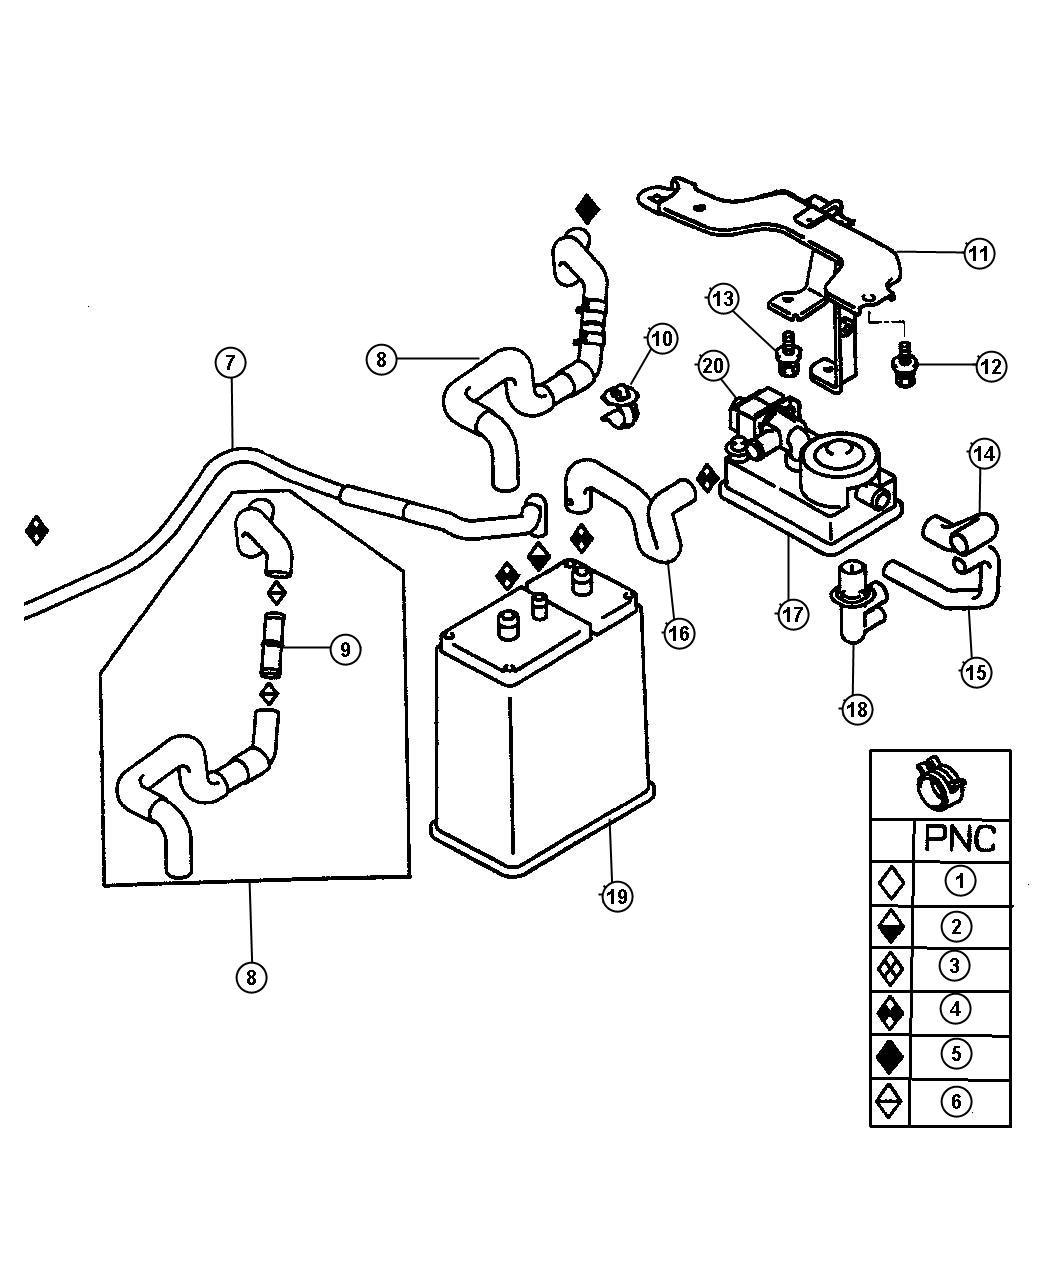 Chrysler Sebring Filter Fuel Vapor Canister Lx Lxi